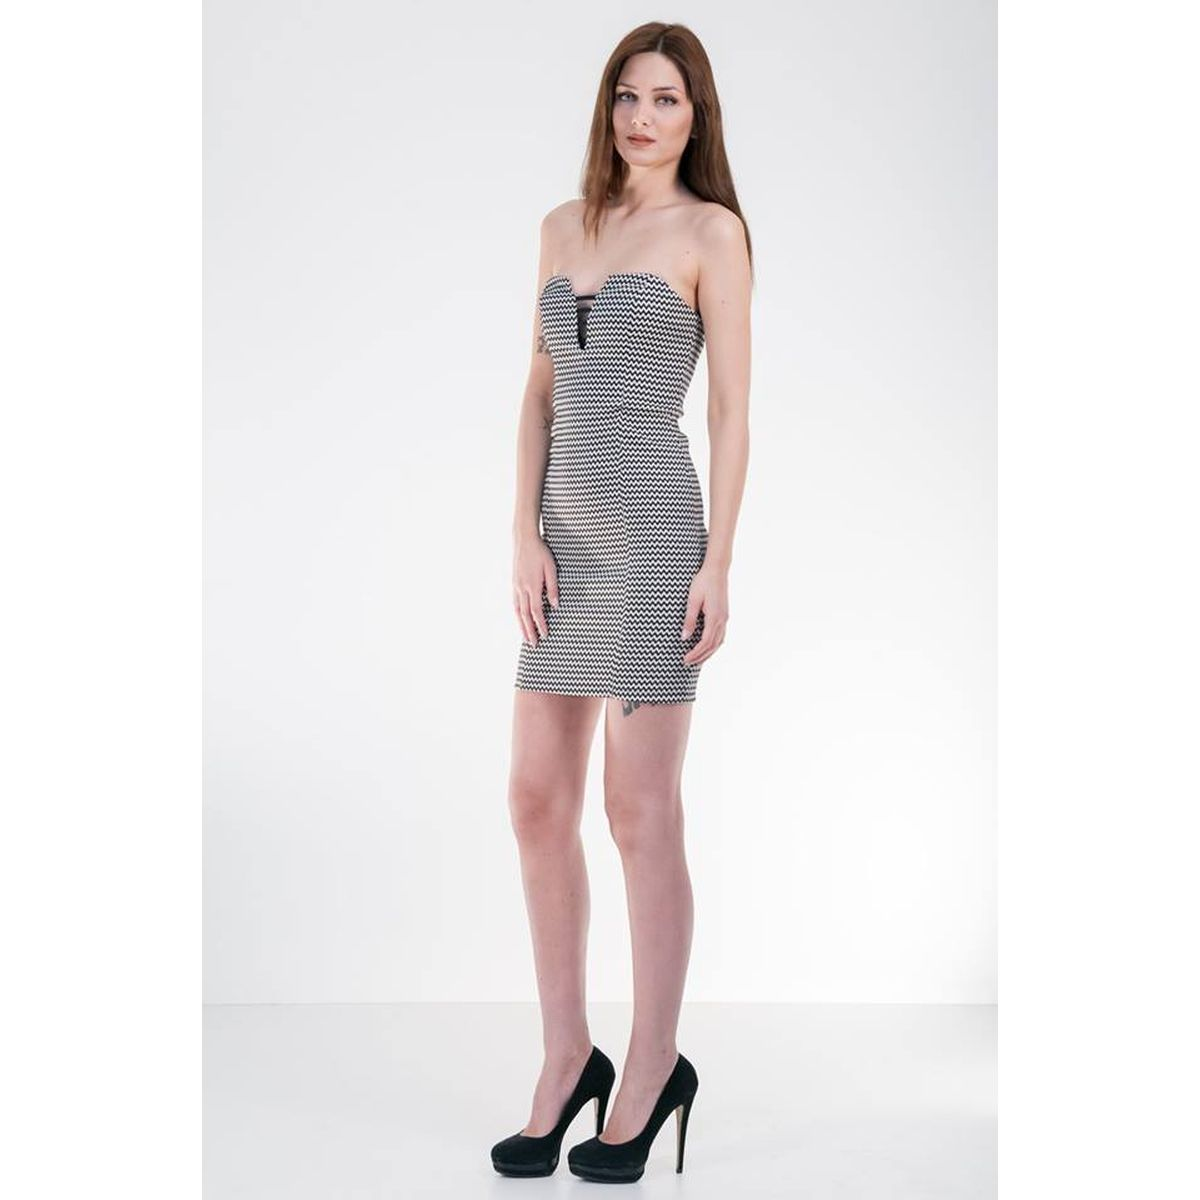 4037bbeb444f Φόρεμα στράπλες κοντό καλοκαιρινό - e-royxa.gr